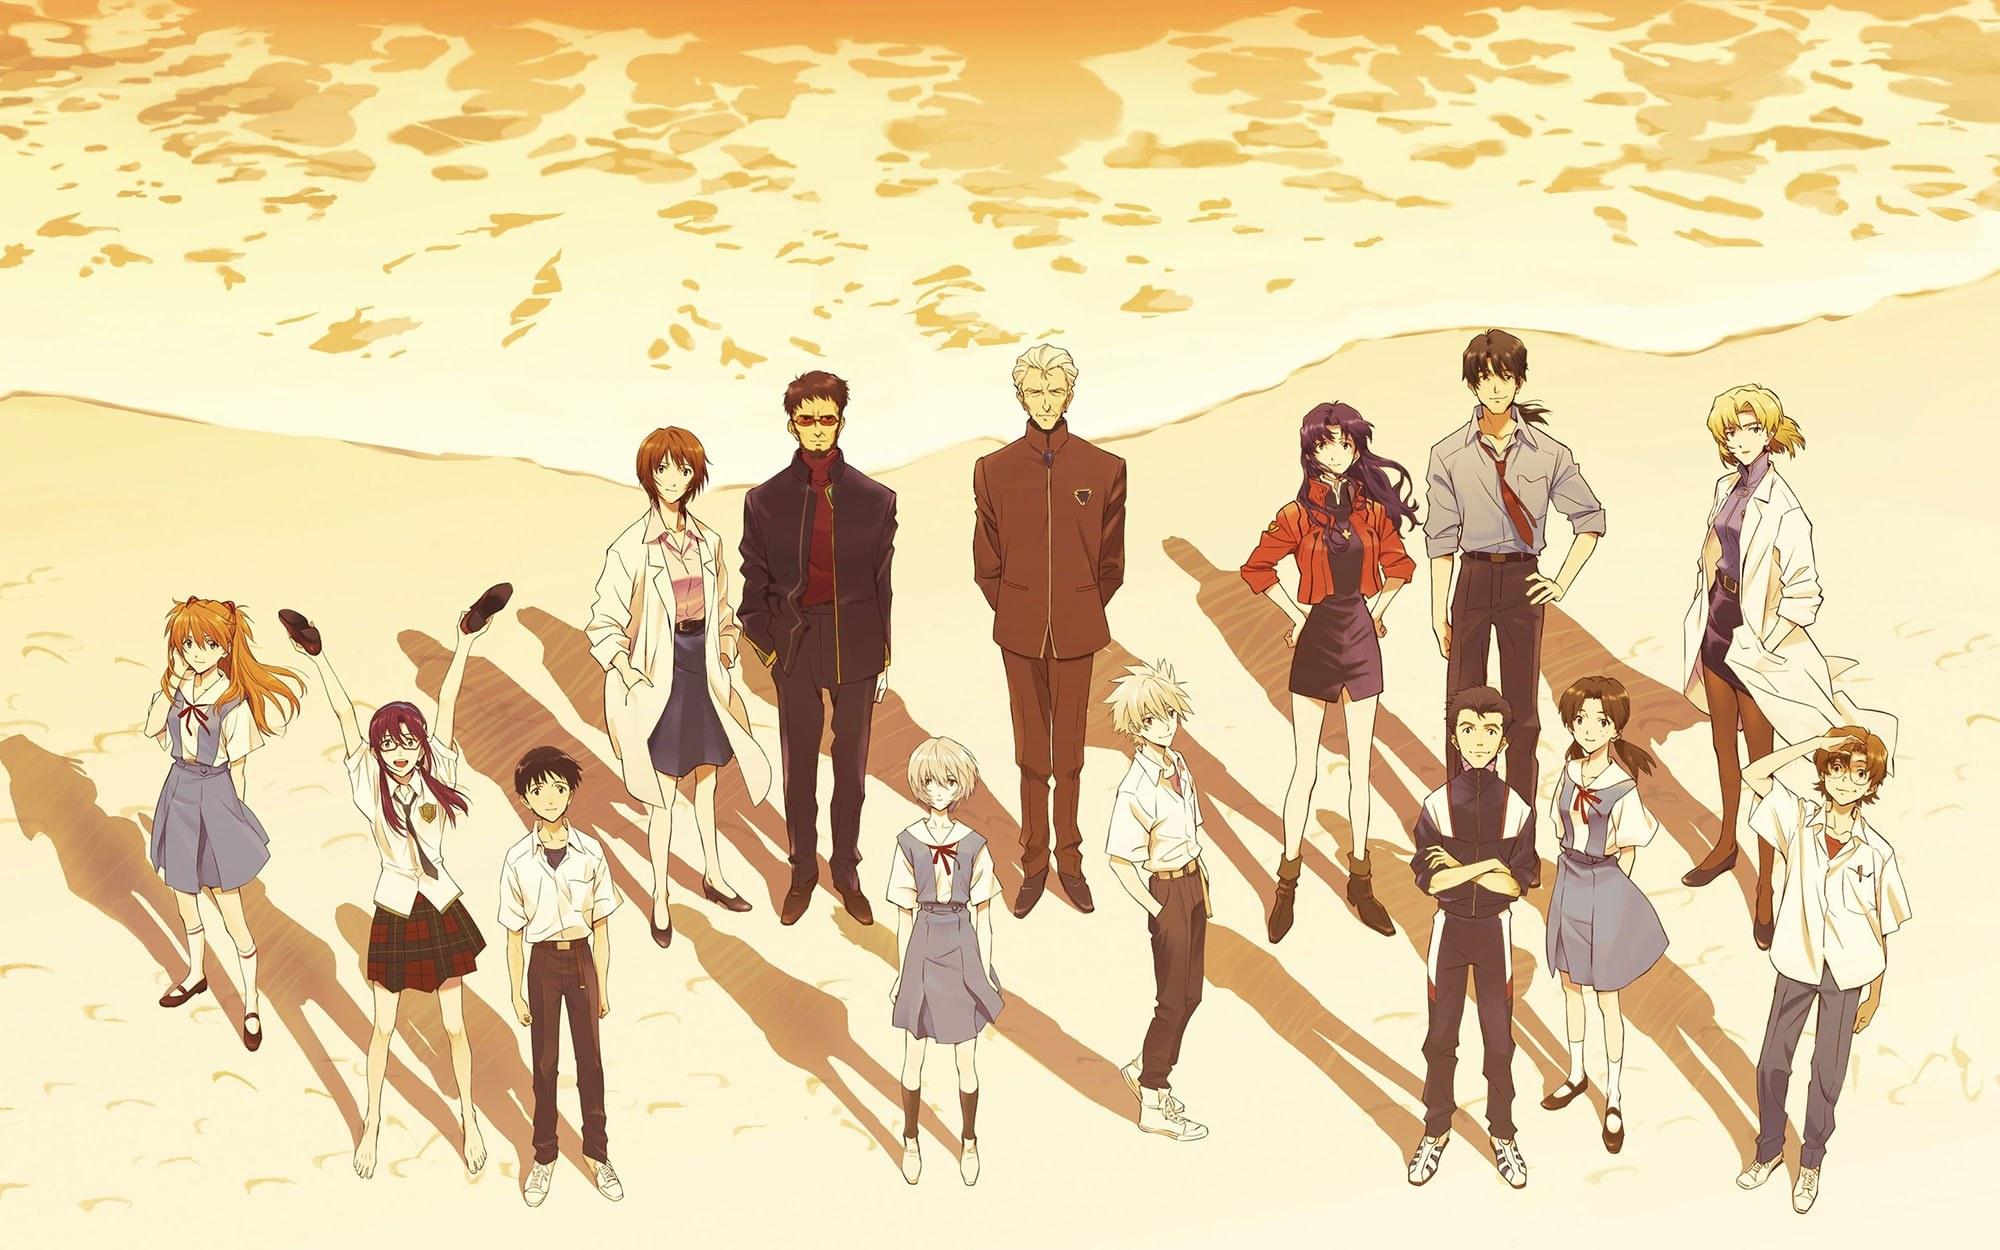 Evangelion: 3.0+1.0 Characters